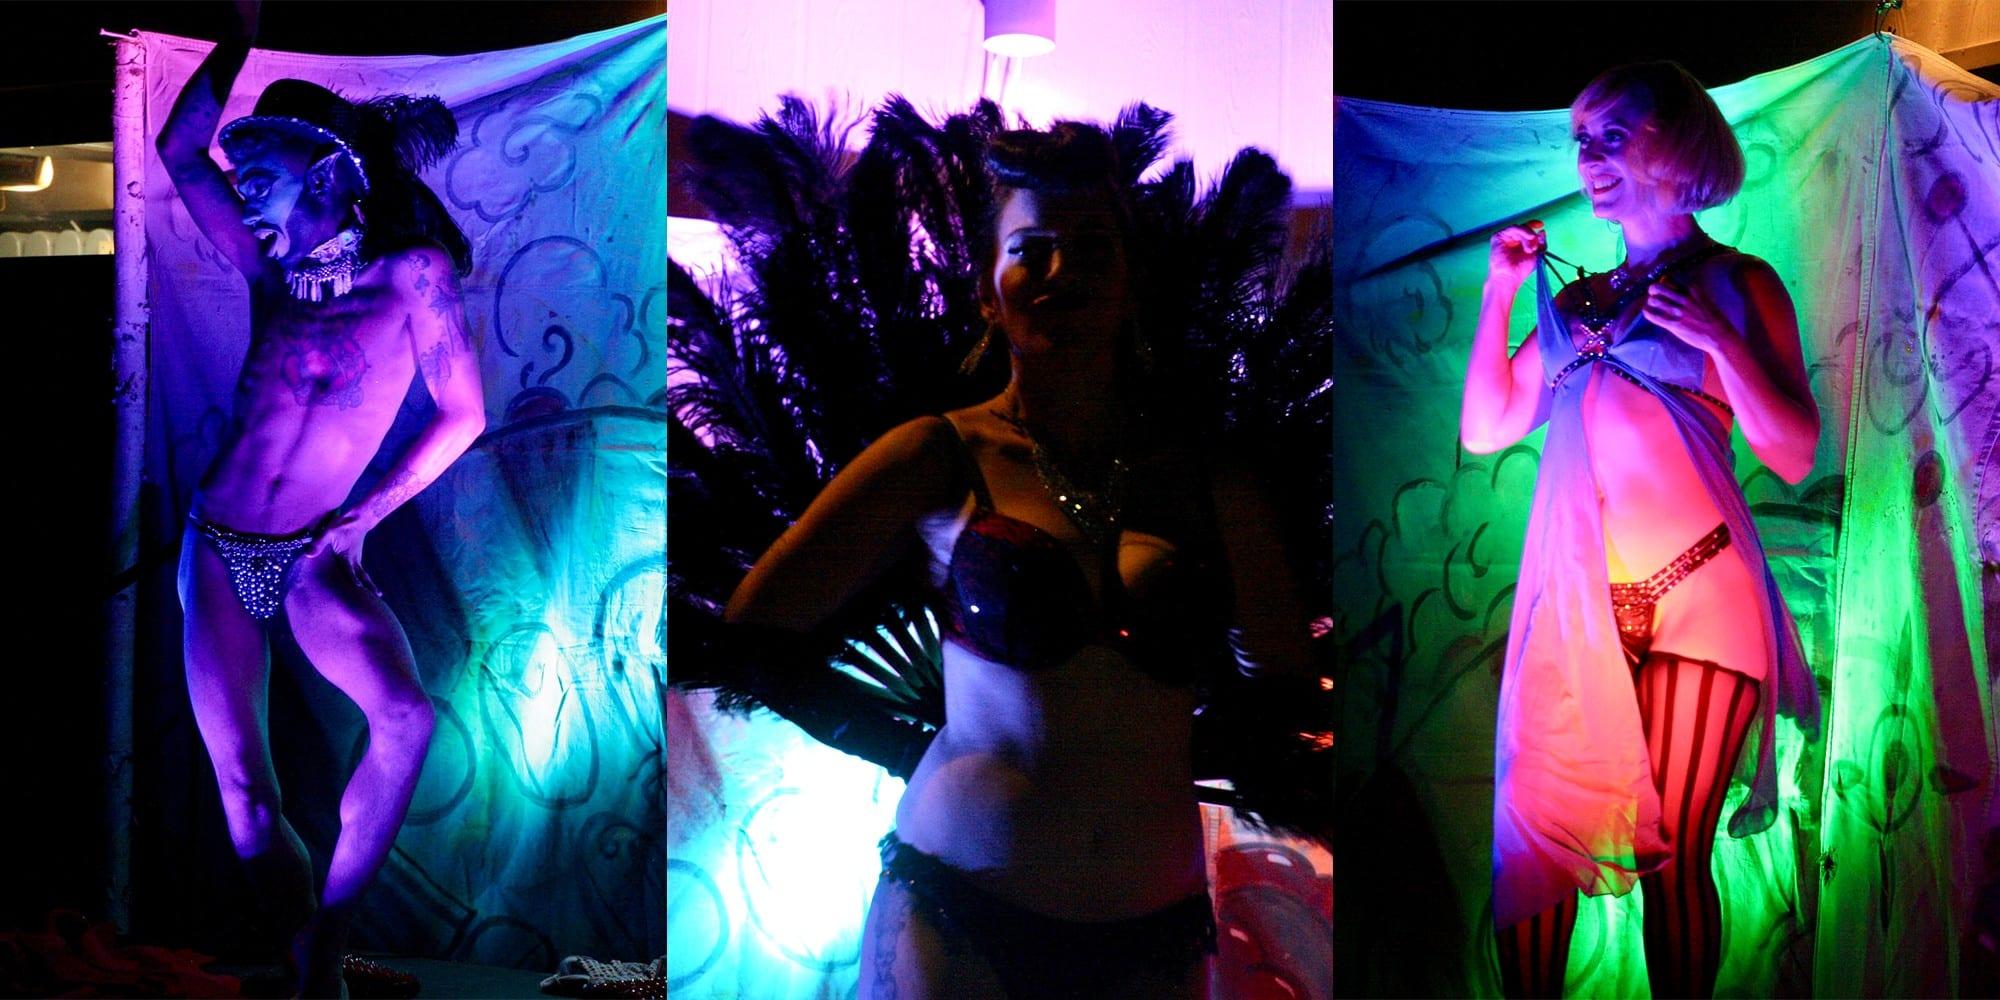 Burlesque at the Dutchtown Karneval.